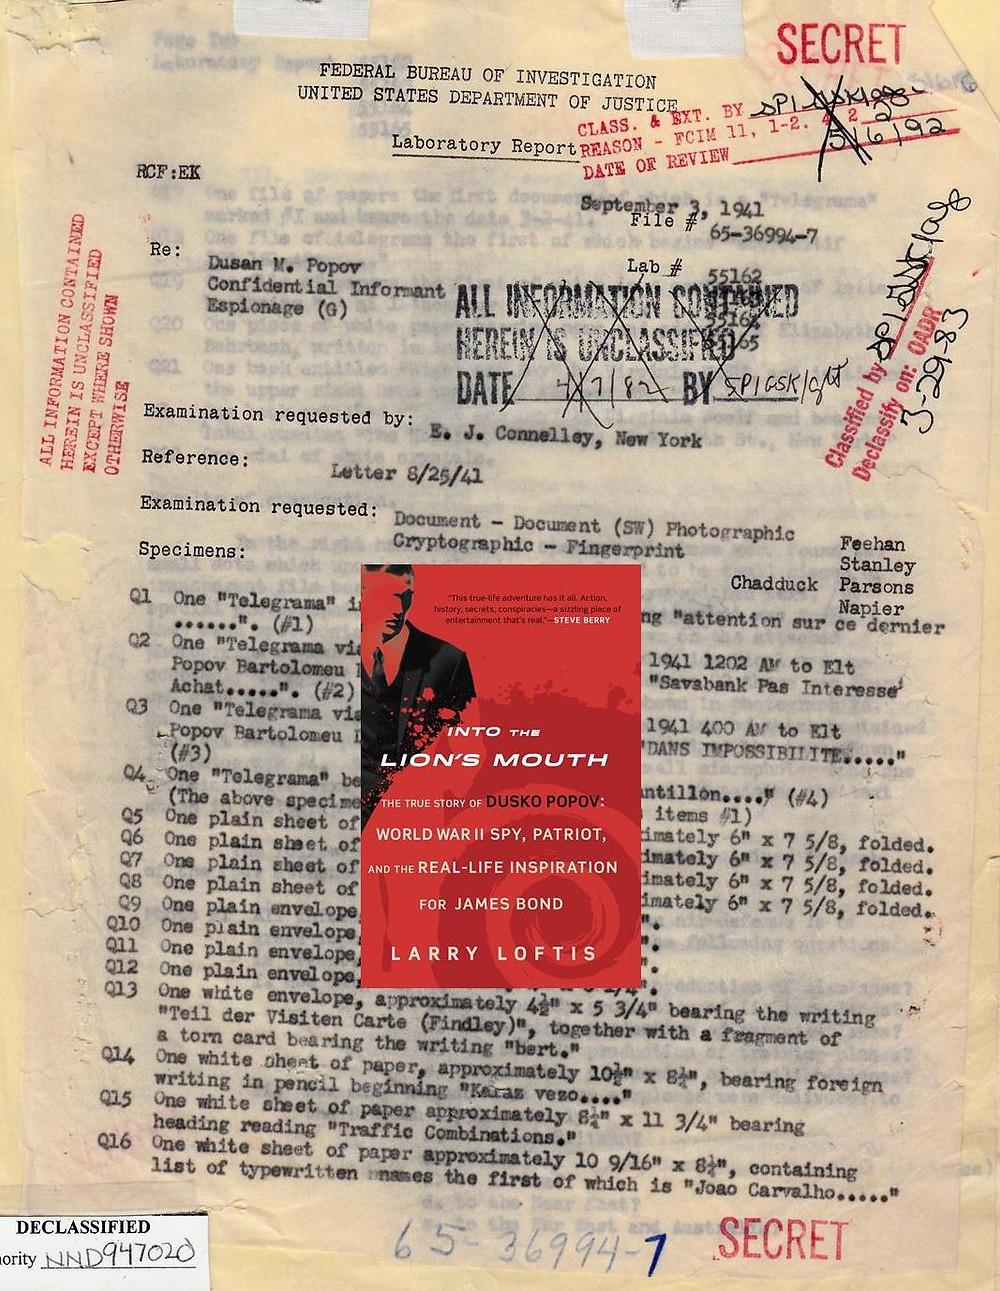 FBI lab report of September 3, 1941.